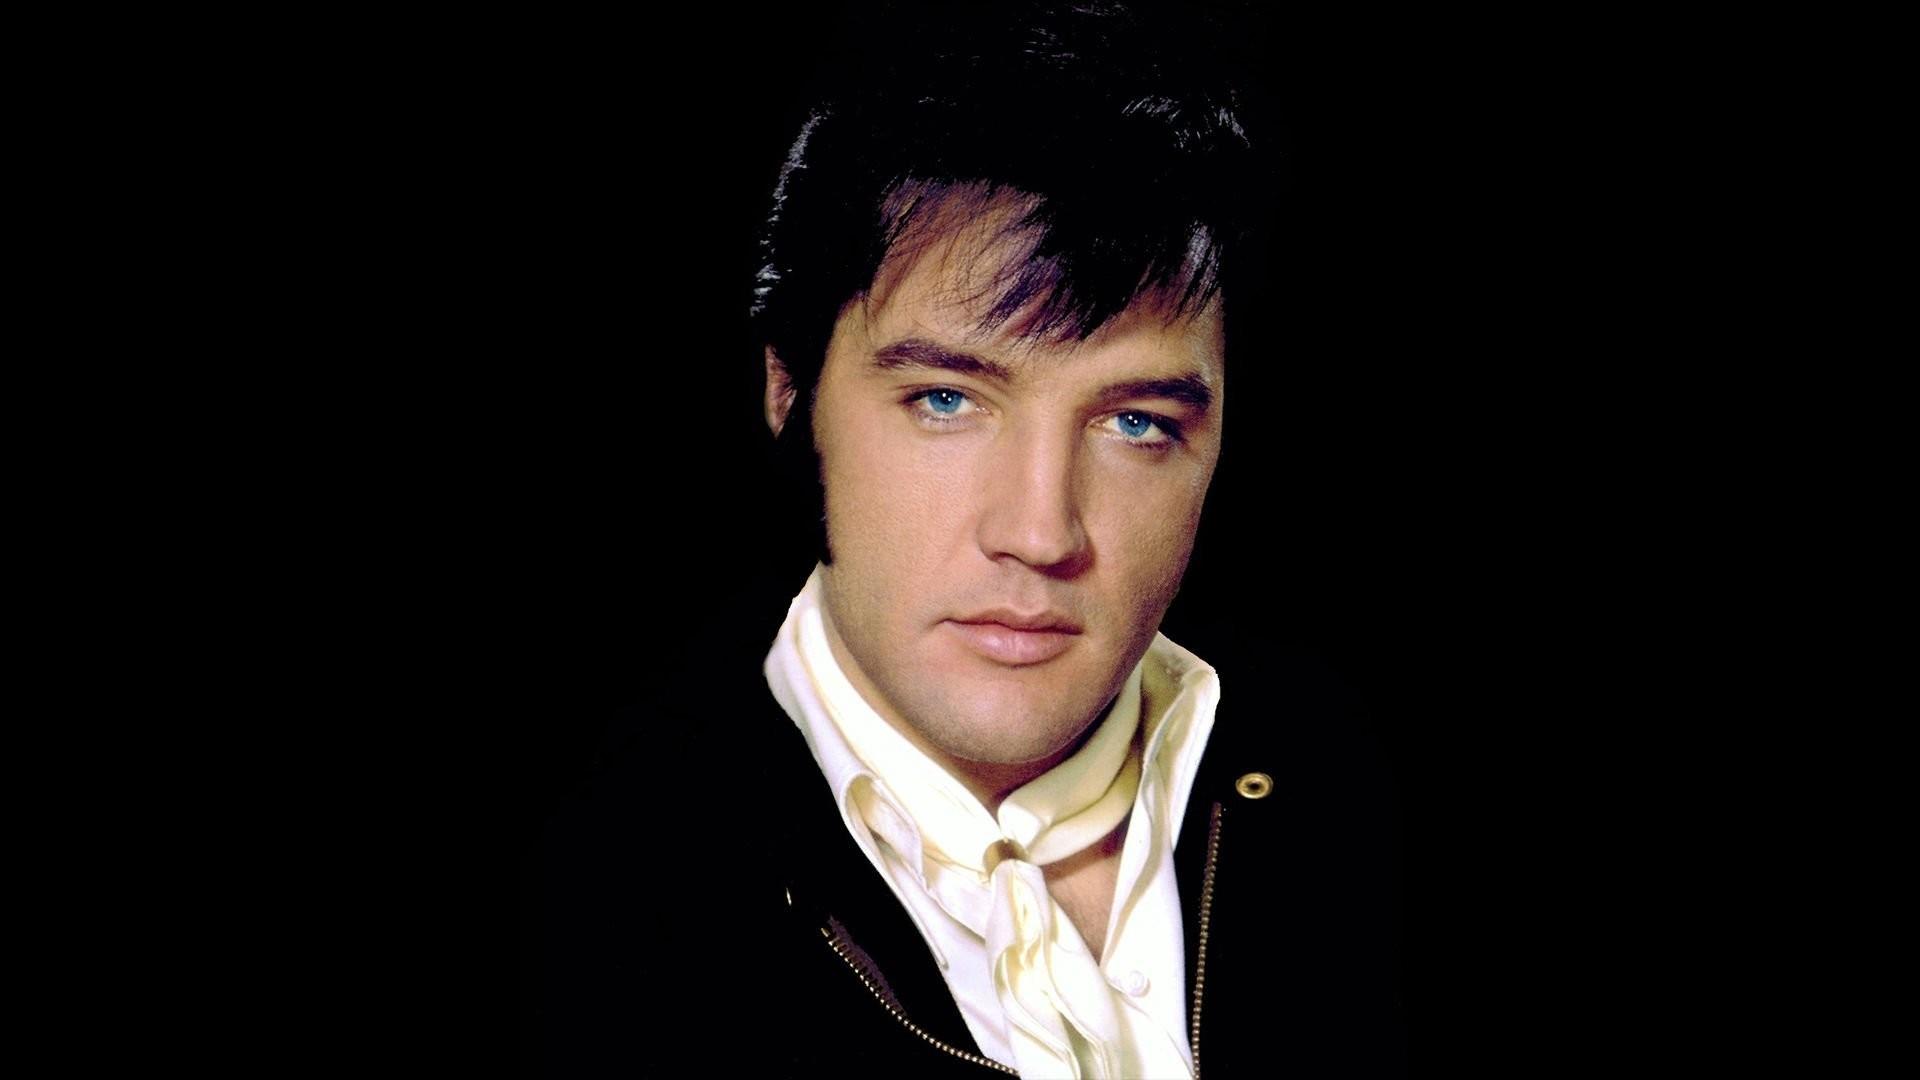 Res: 1920x1080, Elvis Presley Wallpapers 13 - 1920 X 1080